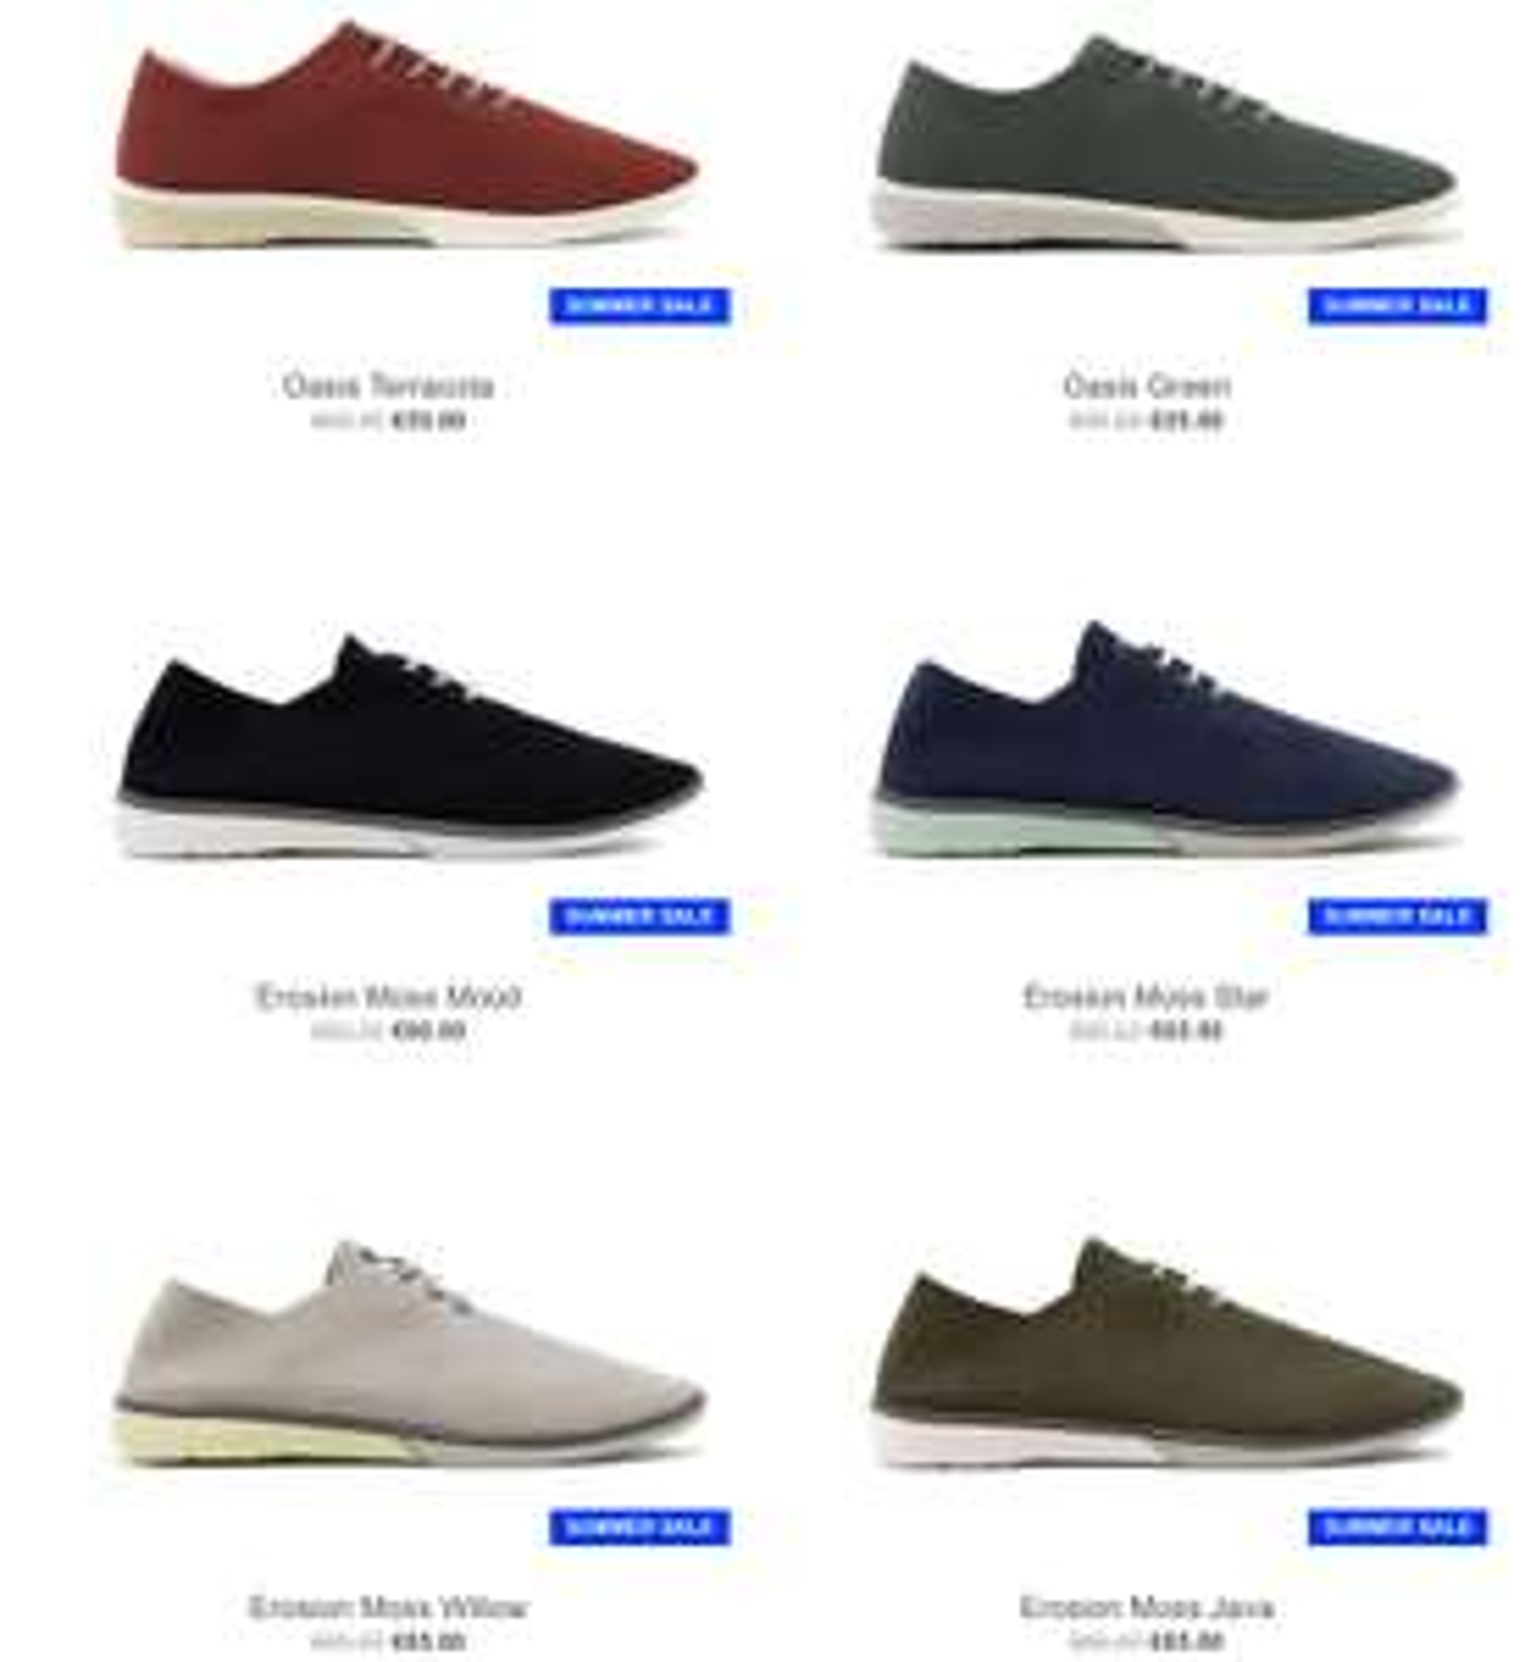 [Muroexe] Diverse Schuhe um 20% reduziert / Derzeitig Bestpreis